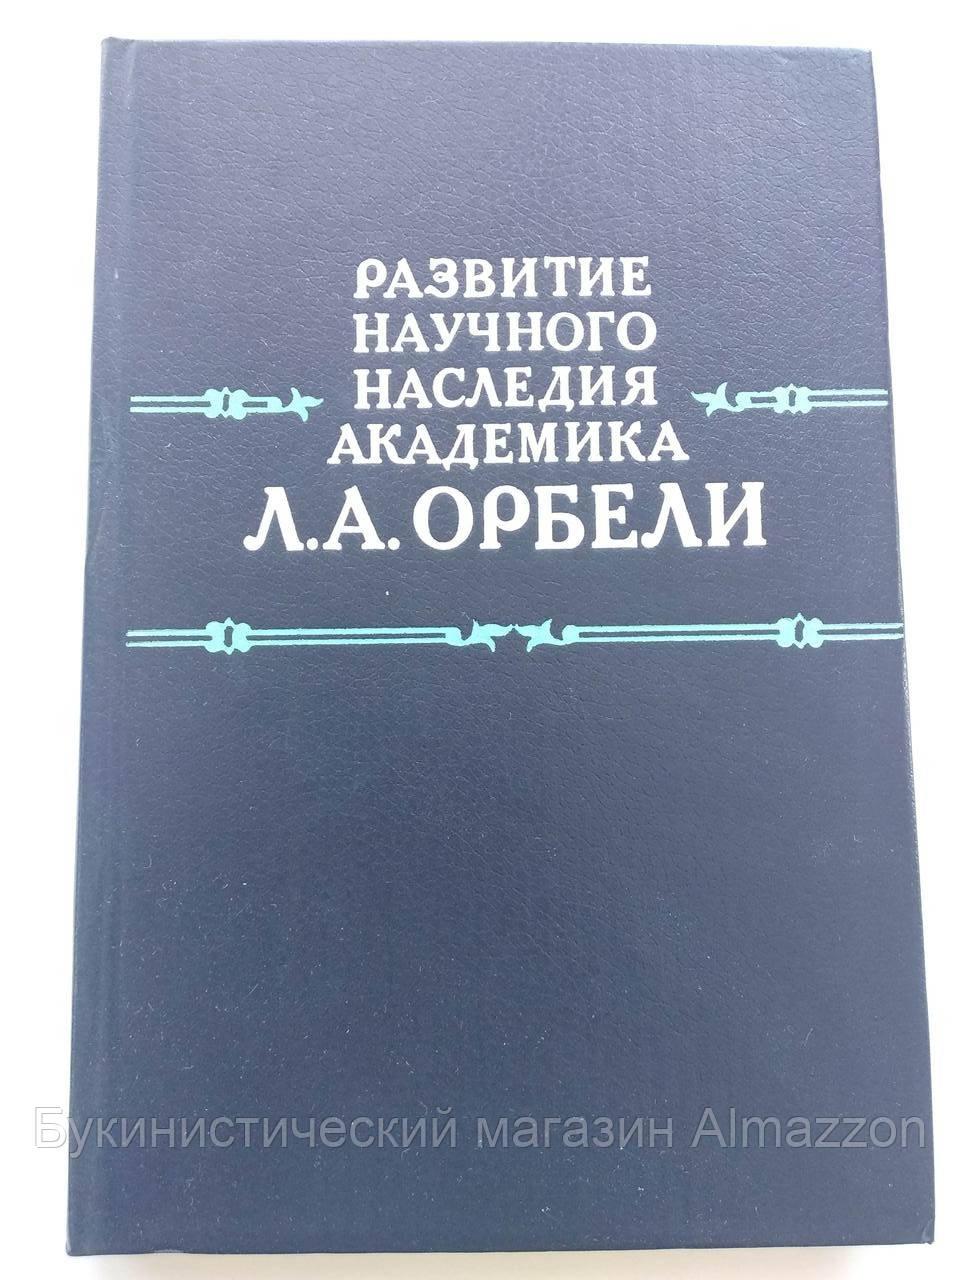 Развитие научного наследия академика Л.А.Орбели